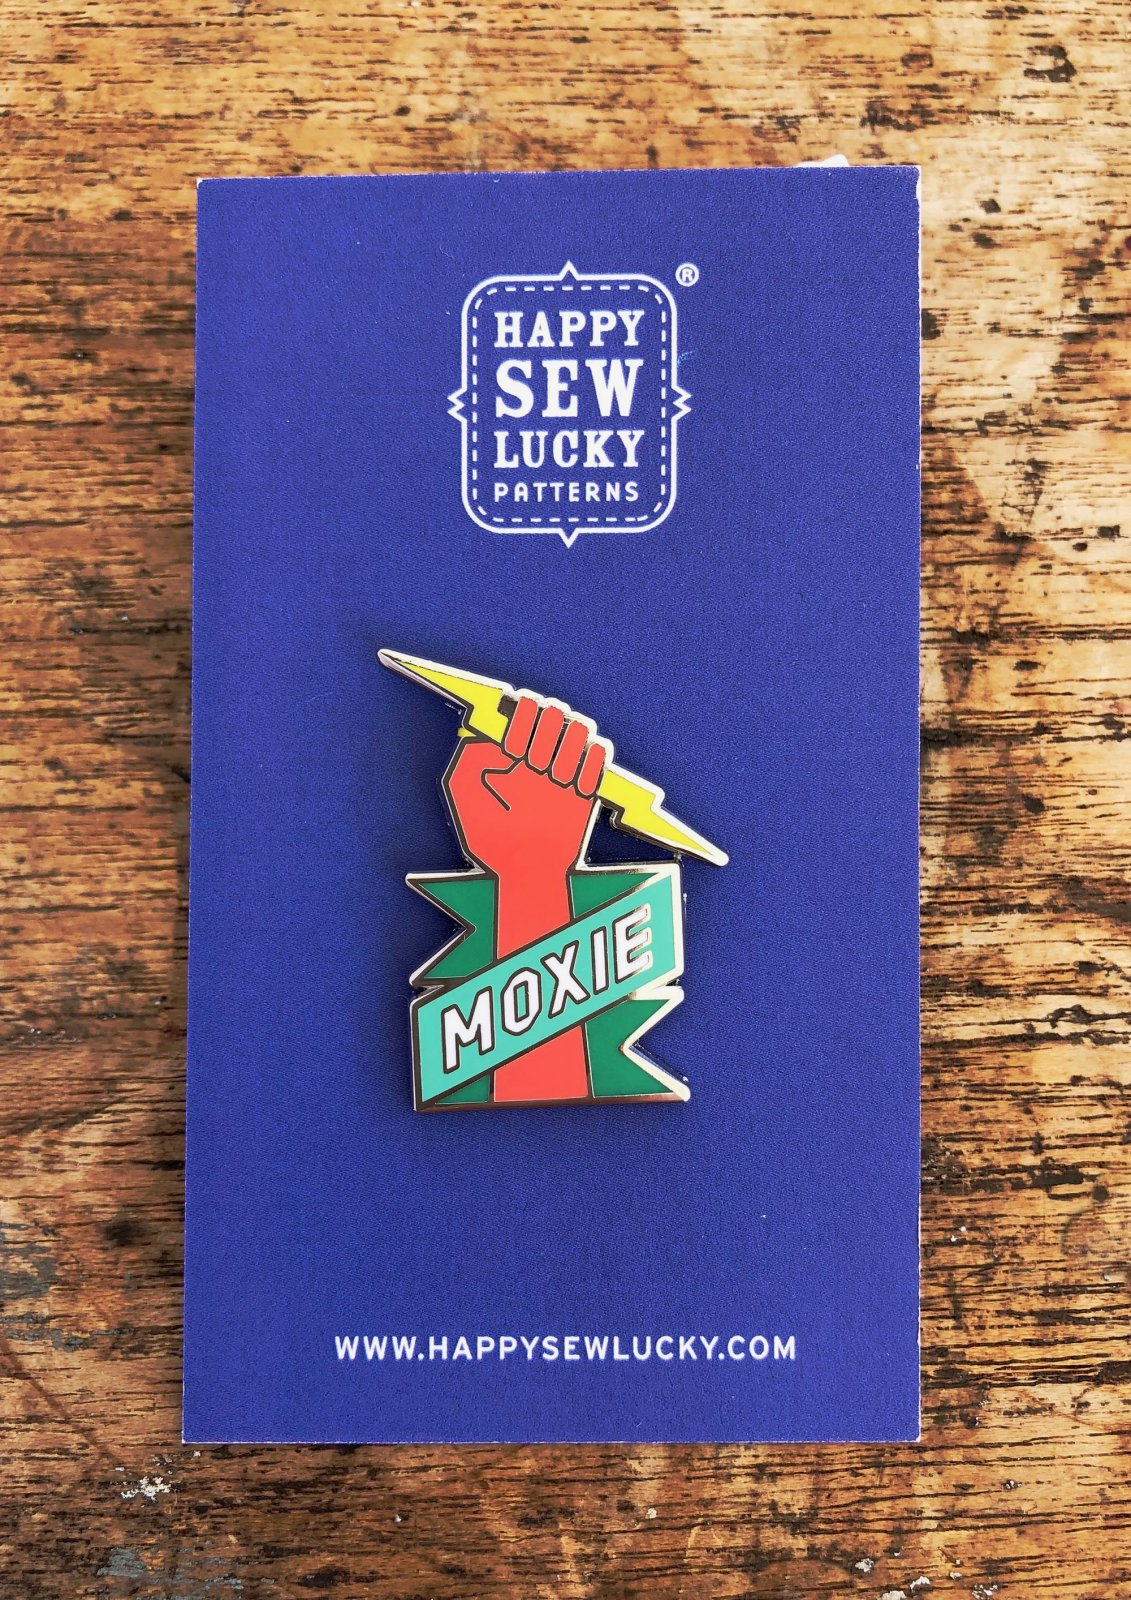 MOXIE Enamel Pin by Happy Sew Lucky